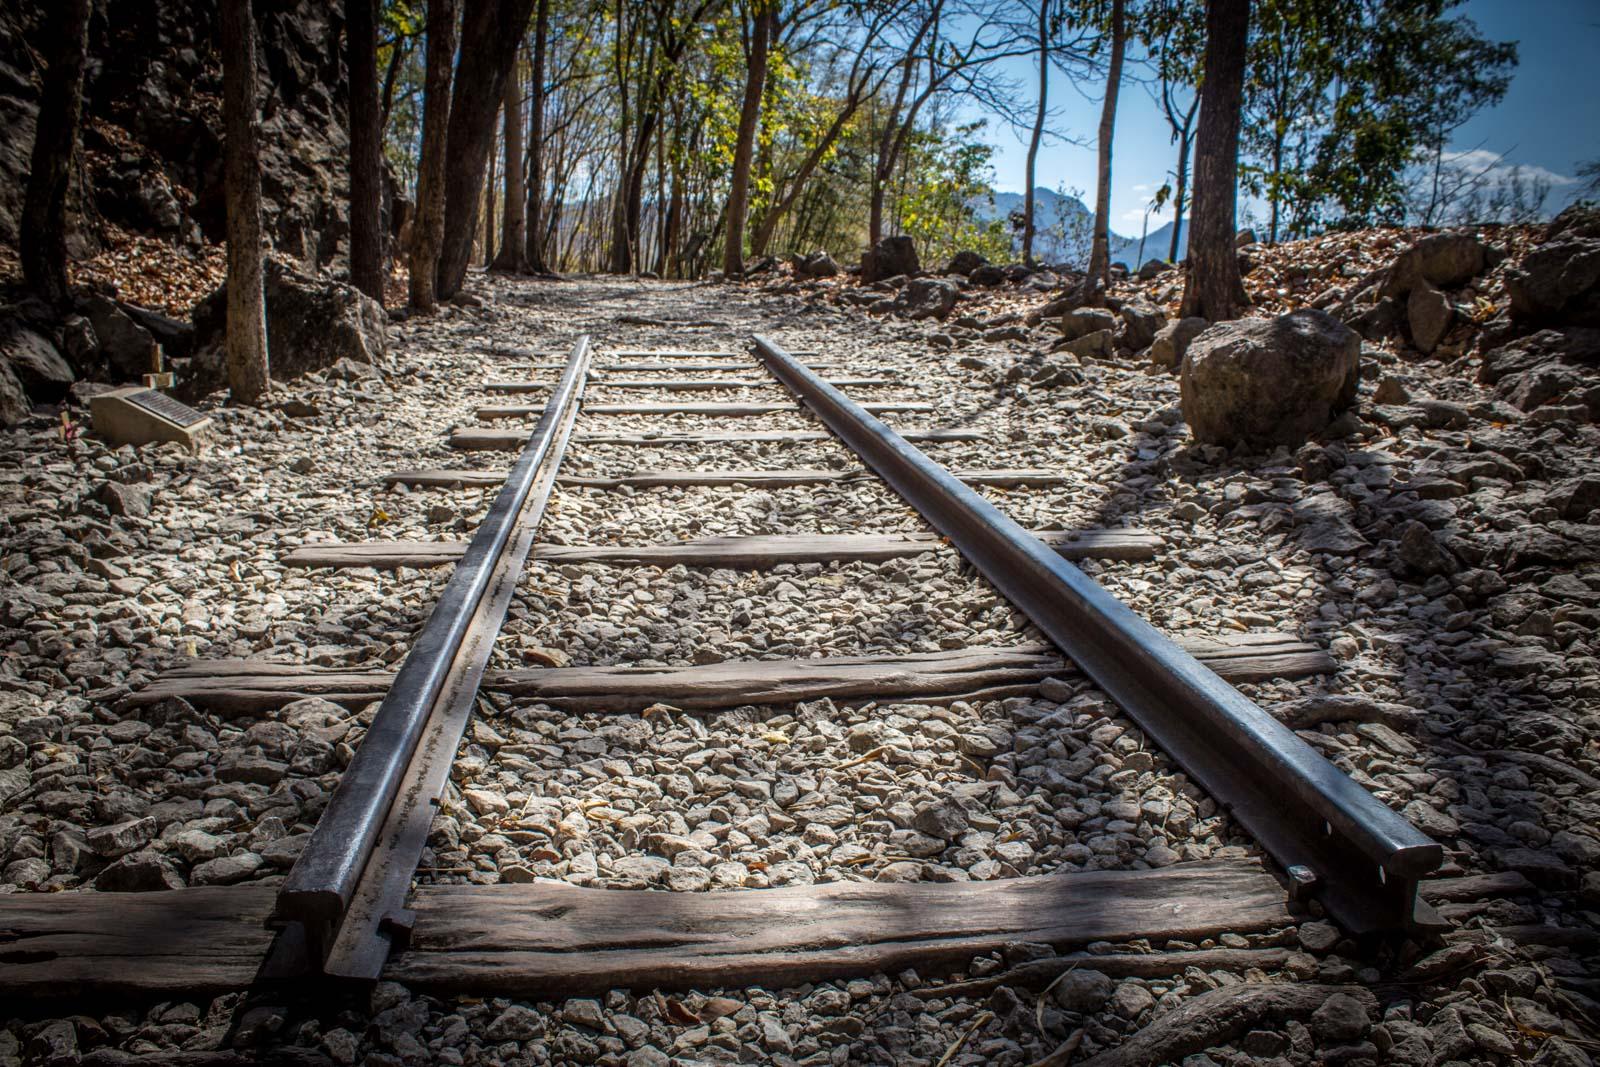 Hellfire Pass, Thailand Burma Railway War Memorial near Kanchanaburi, Thailand